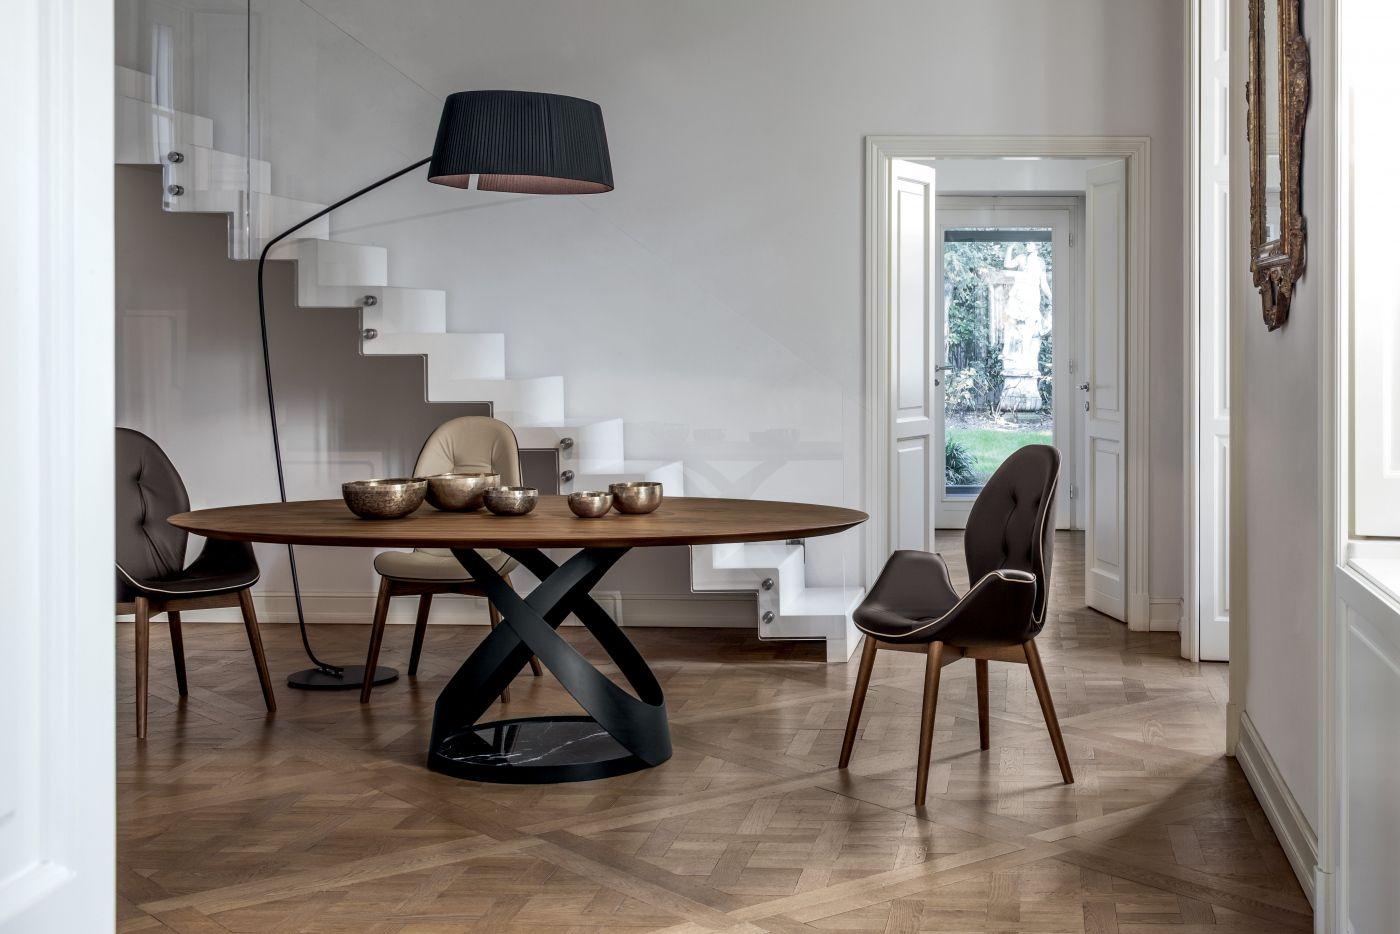 Rivalto Tonin Casa Lighting Haus Deko Esstisch Design Esstisch Oval